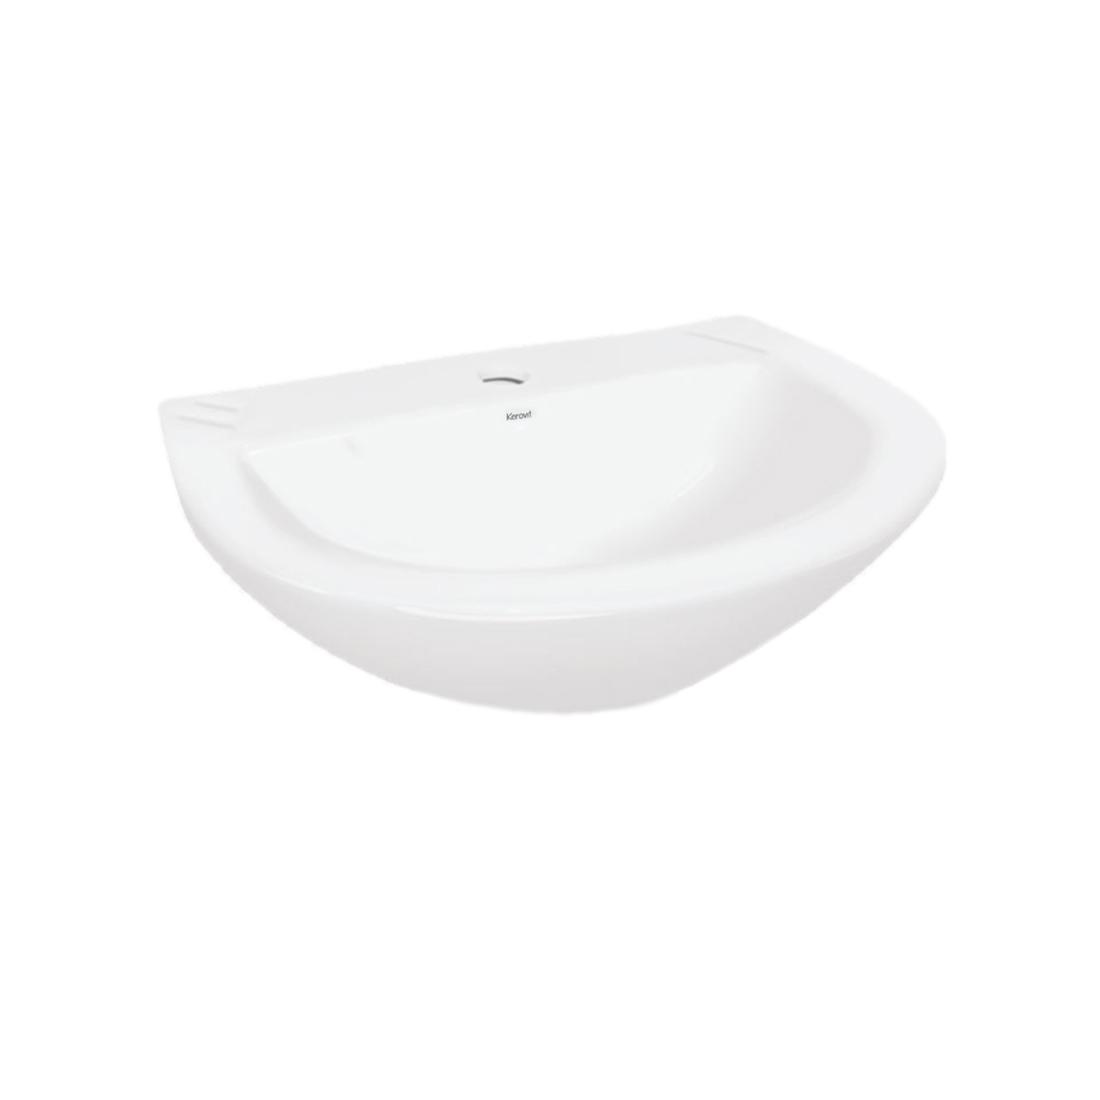 Kerovit Azelia KS237 Wash Basin